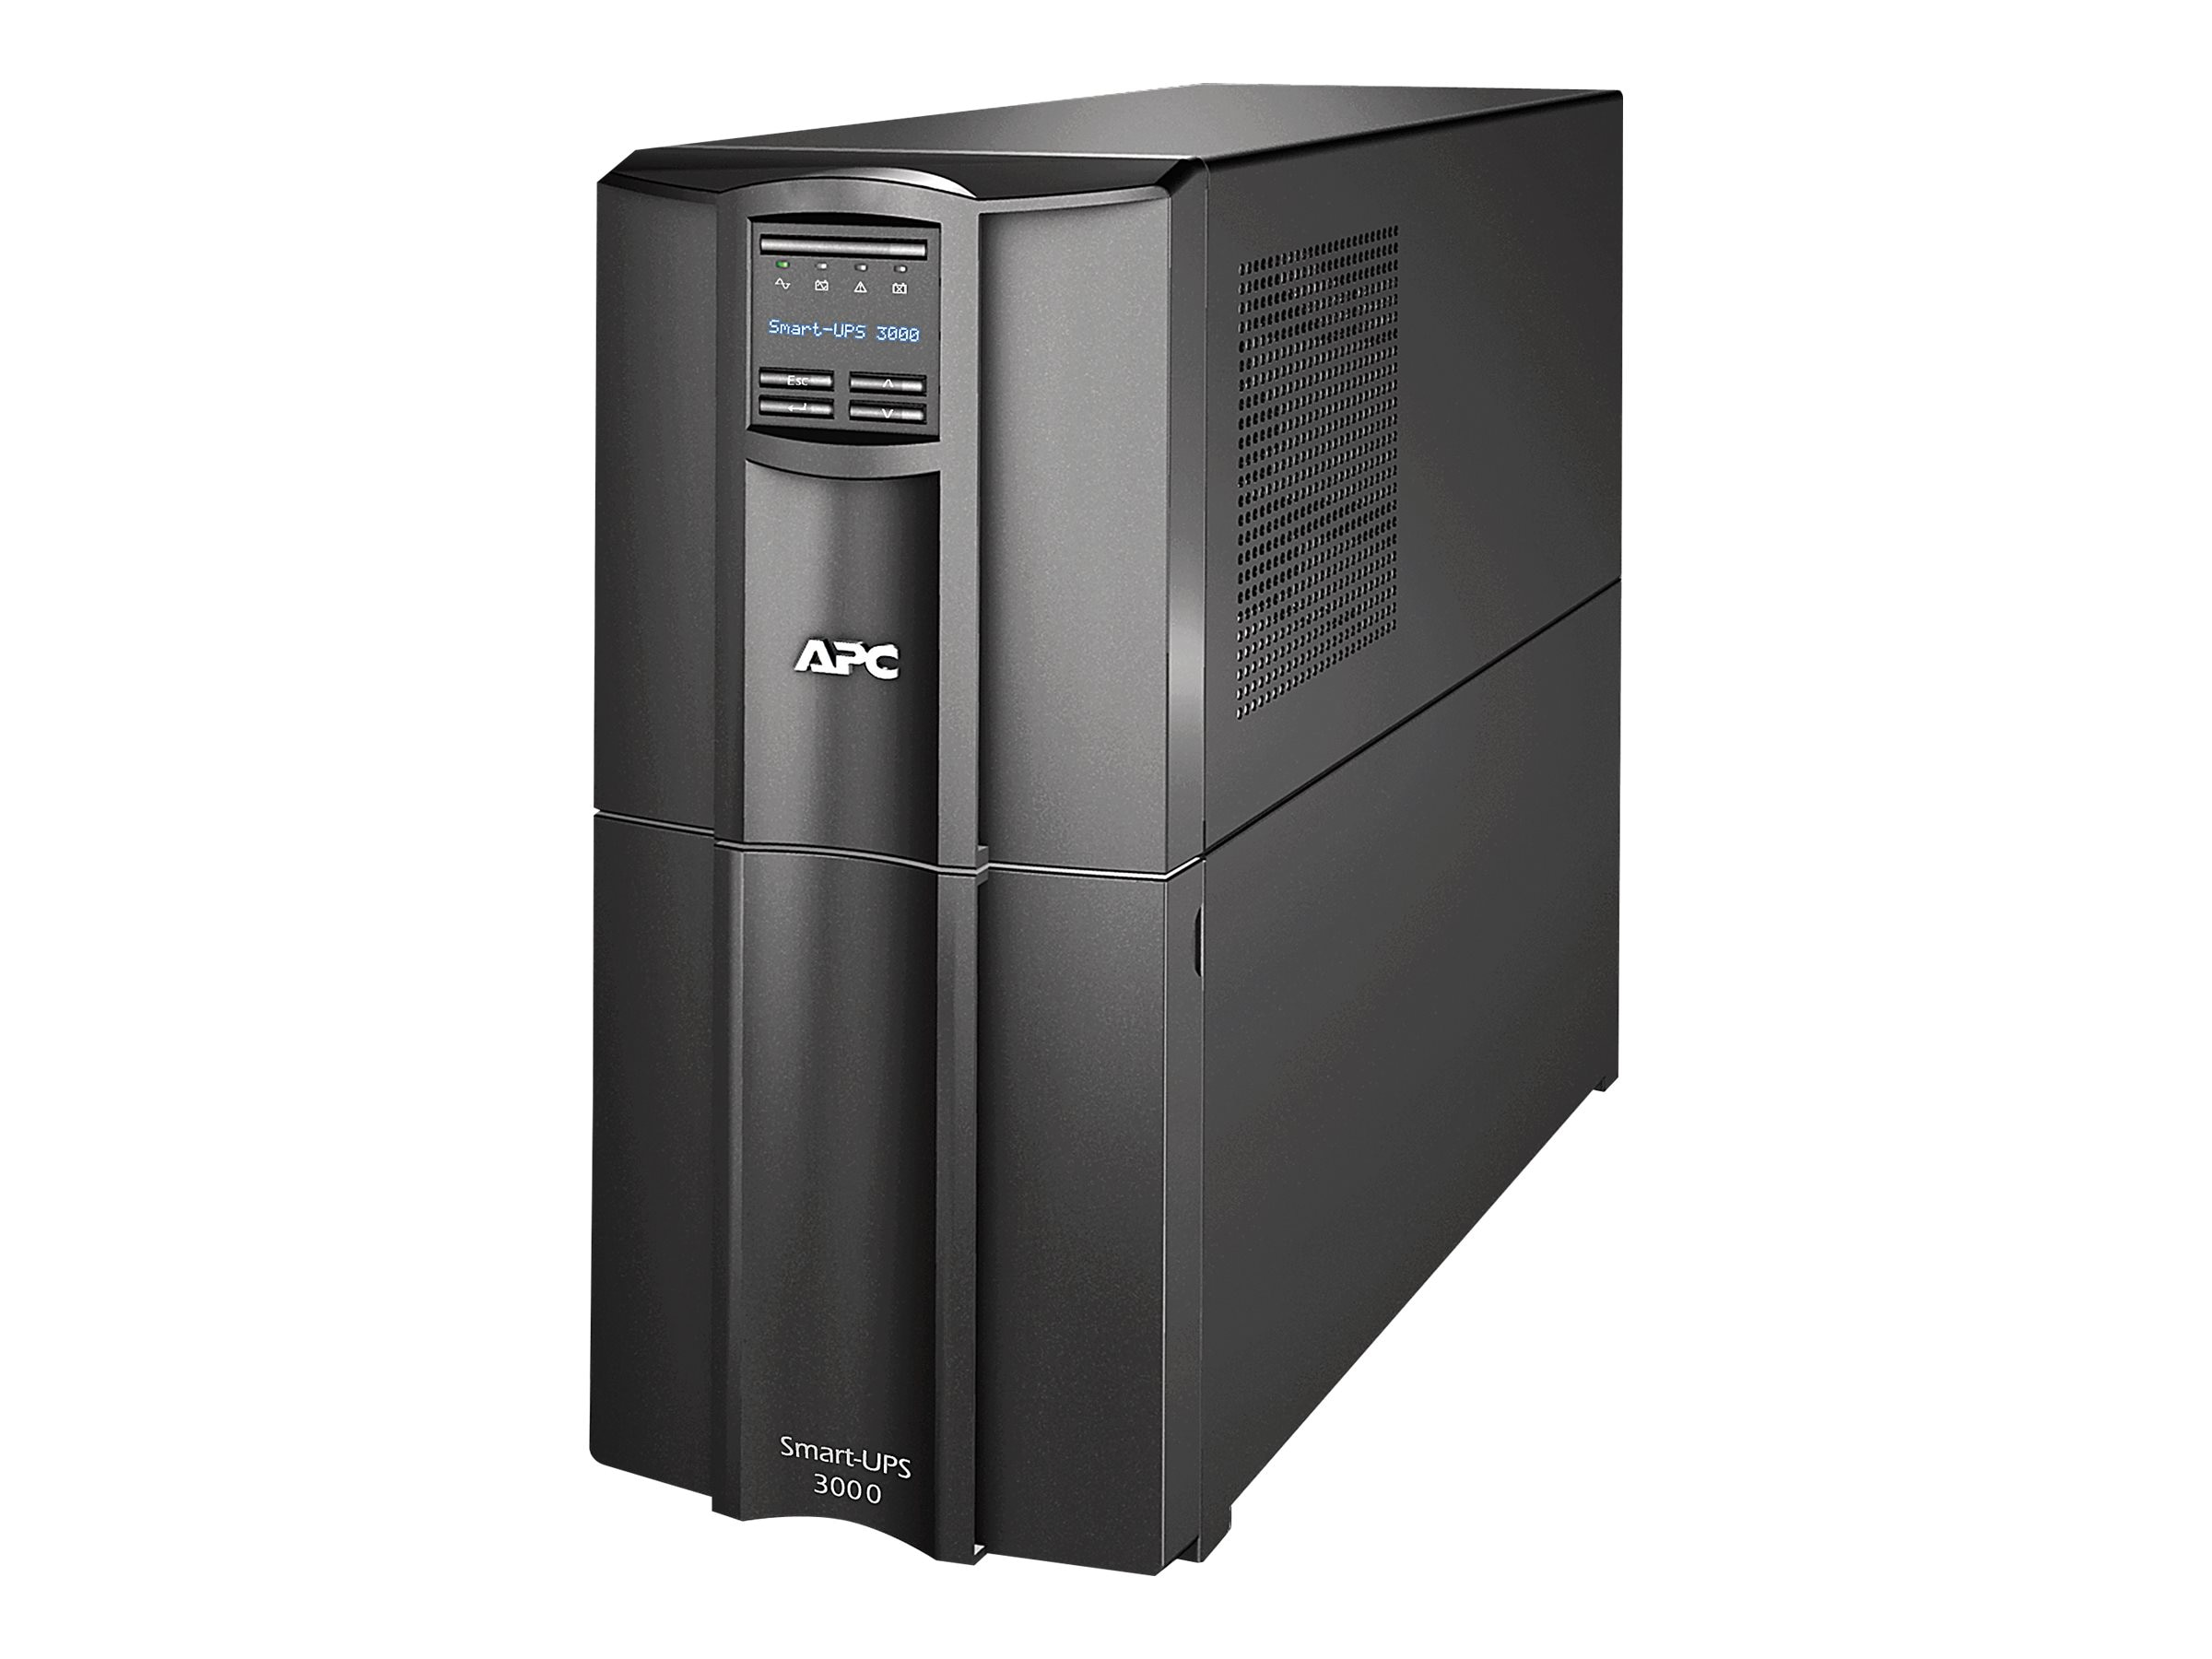 APC Smart-UPS 3000VA LCD Tower 120V w SmartConnect, Instant Rebate - Save  $101